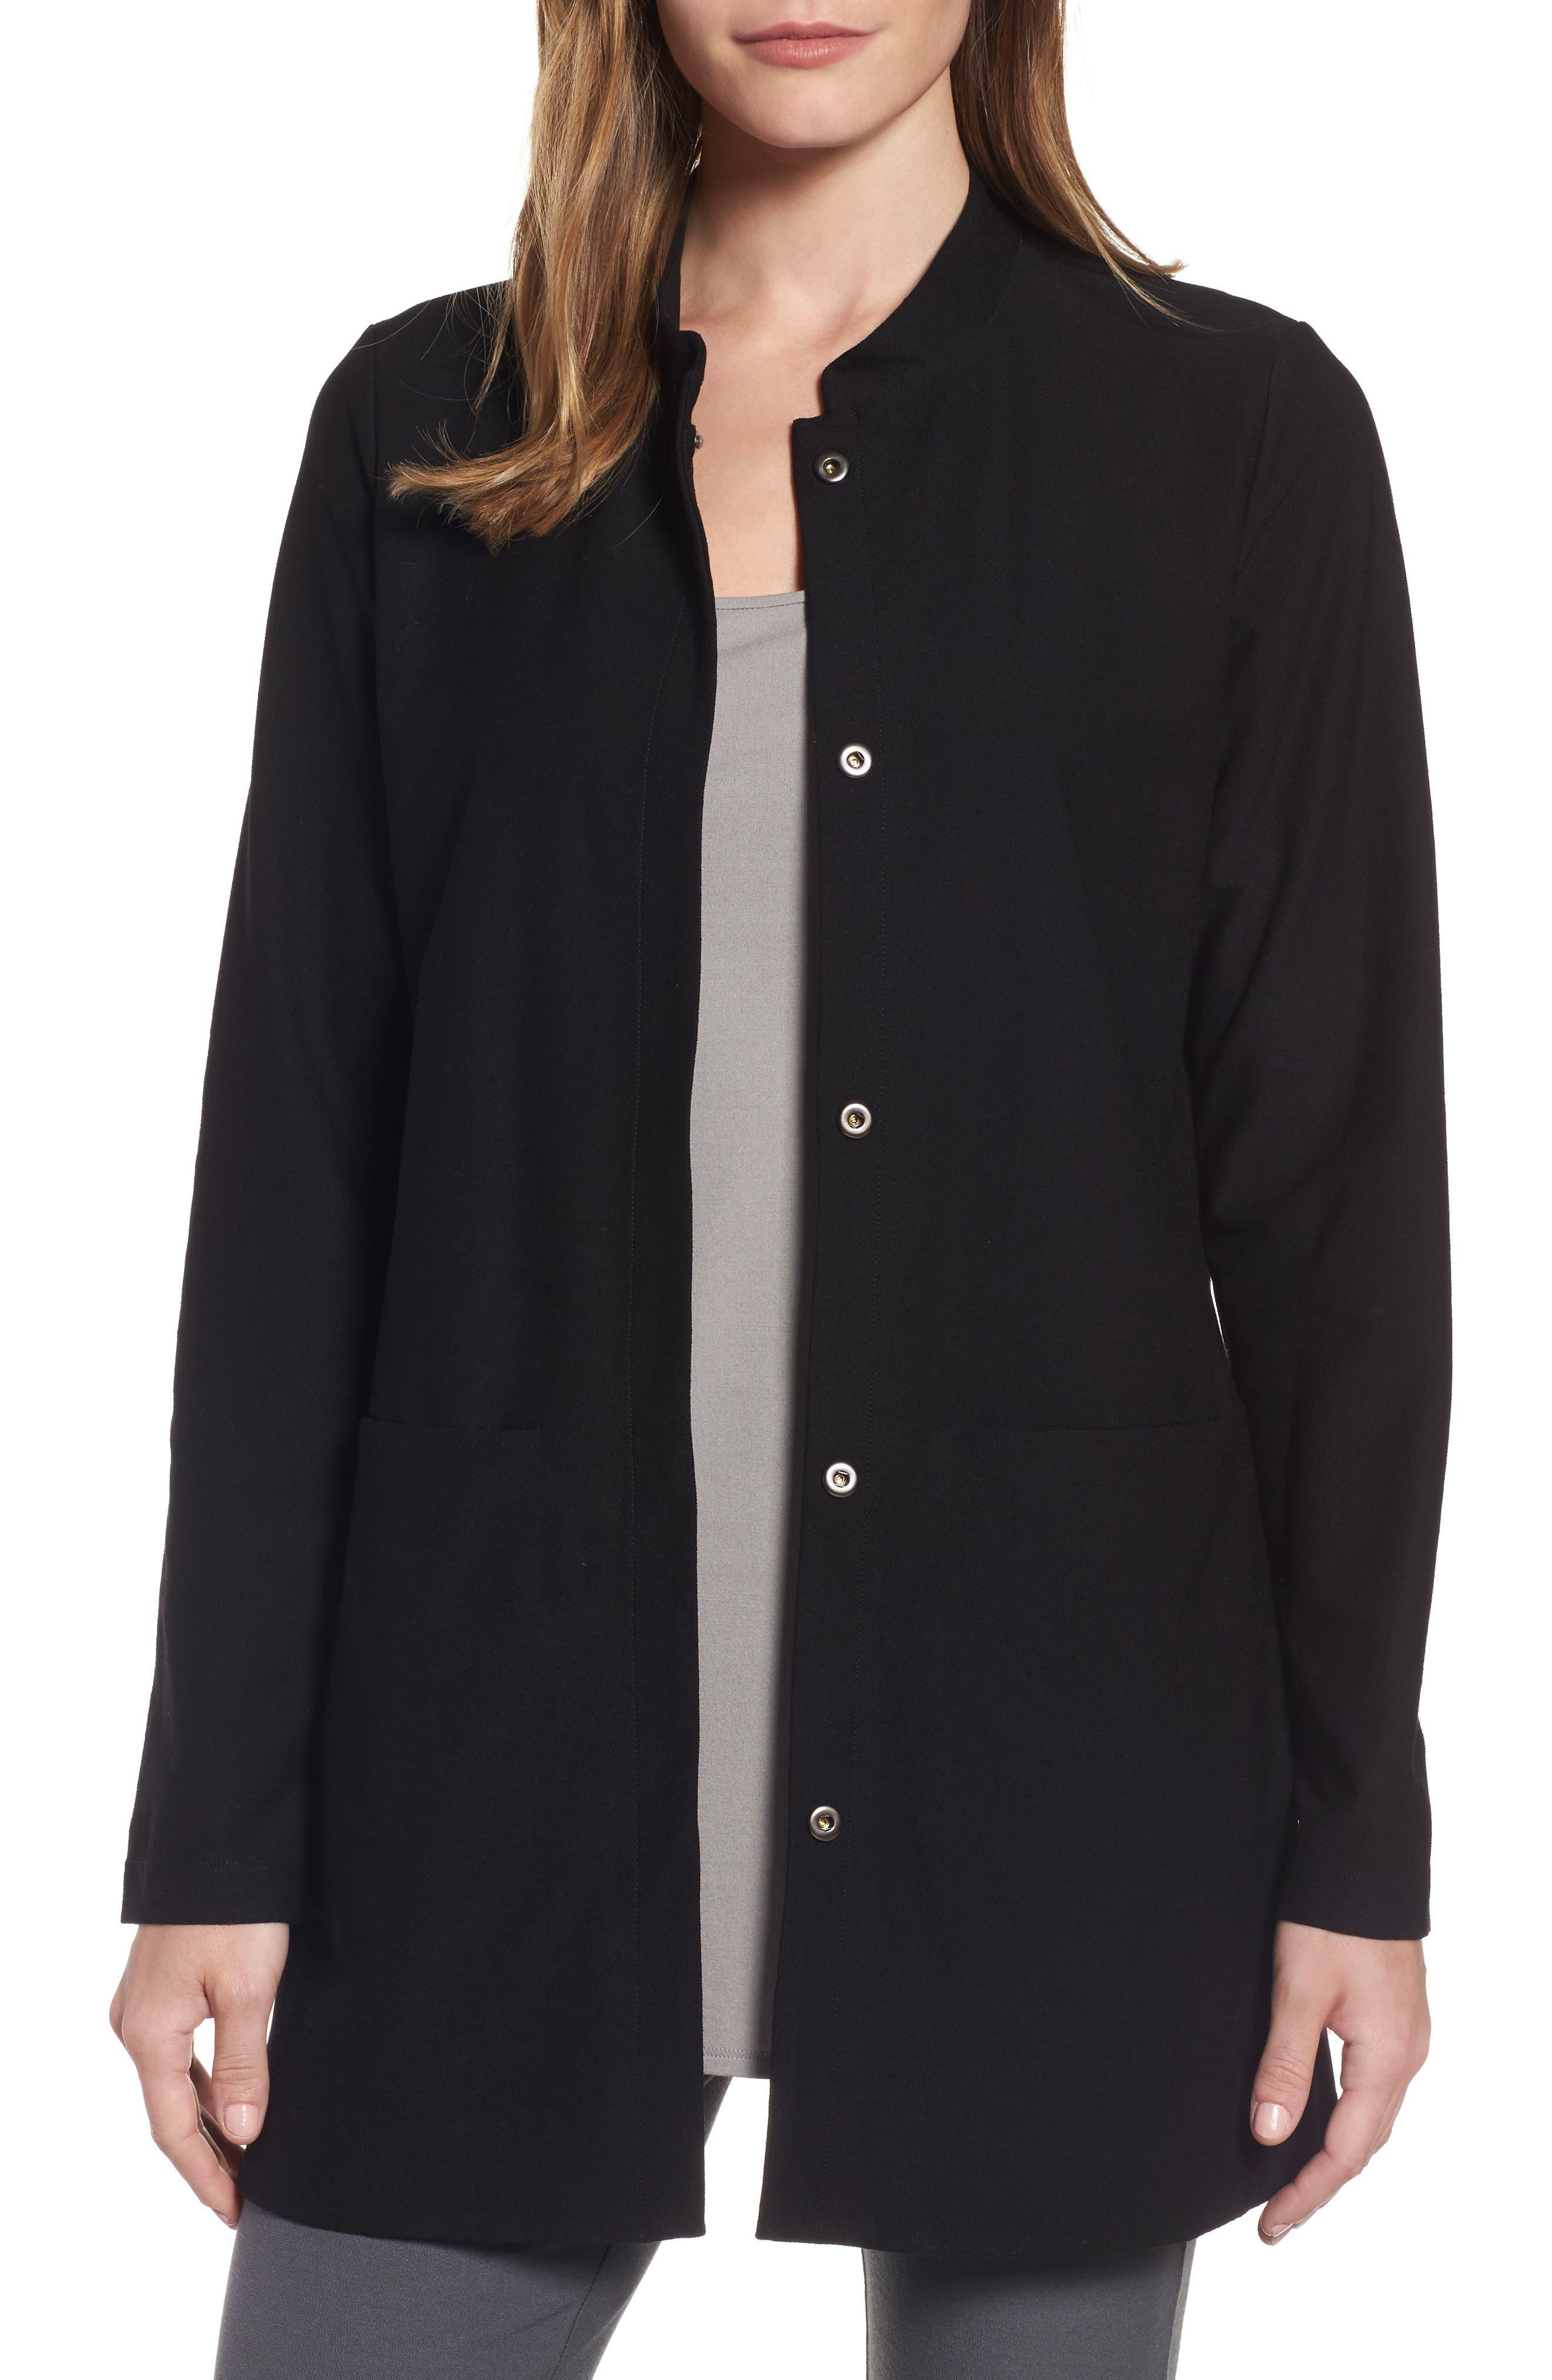 Eileen Fisher Mandarin Collar Knit Jacket (Regular & Petite)